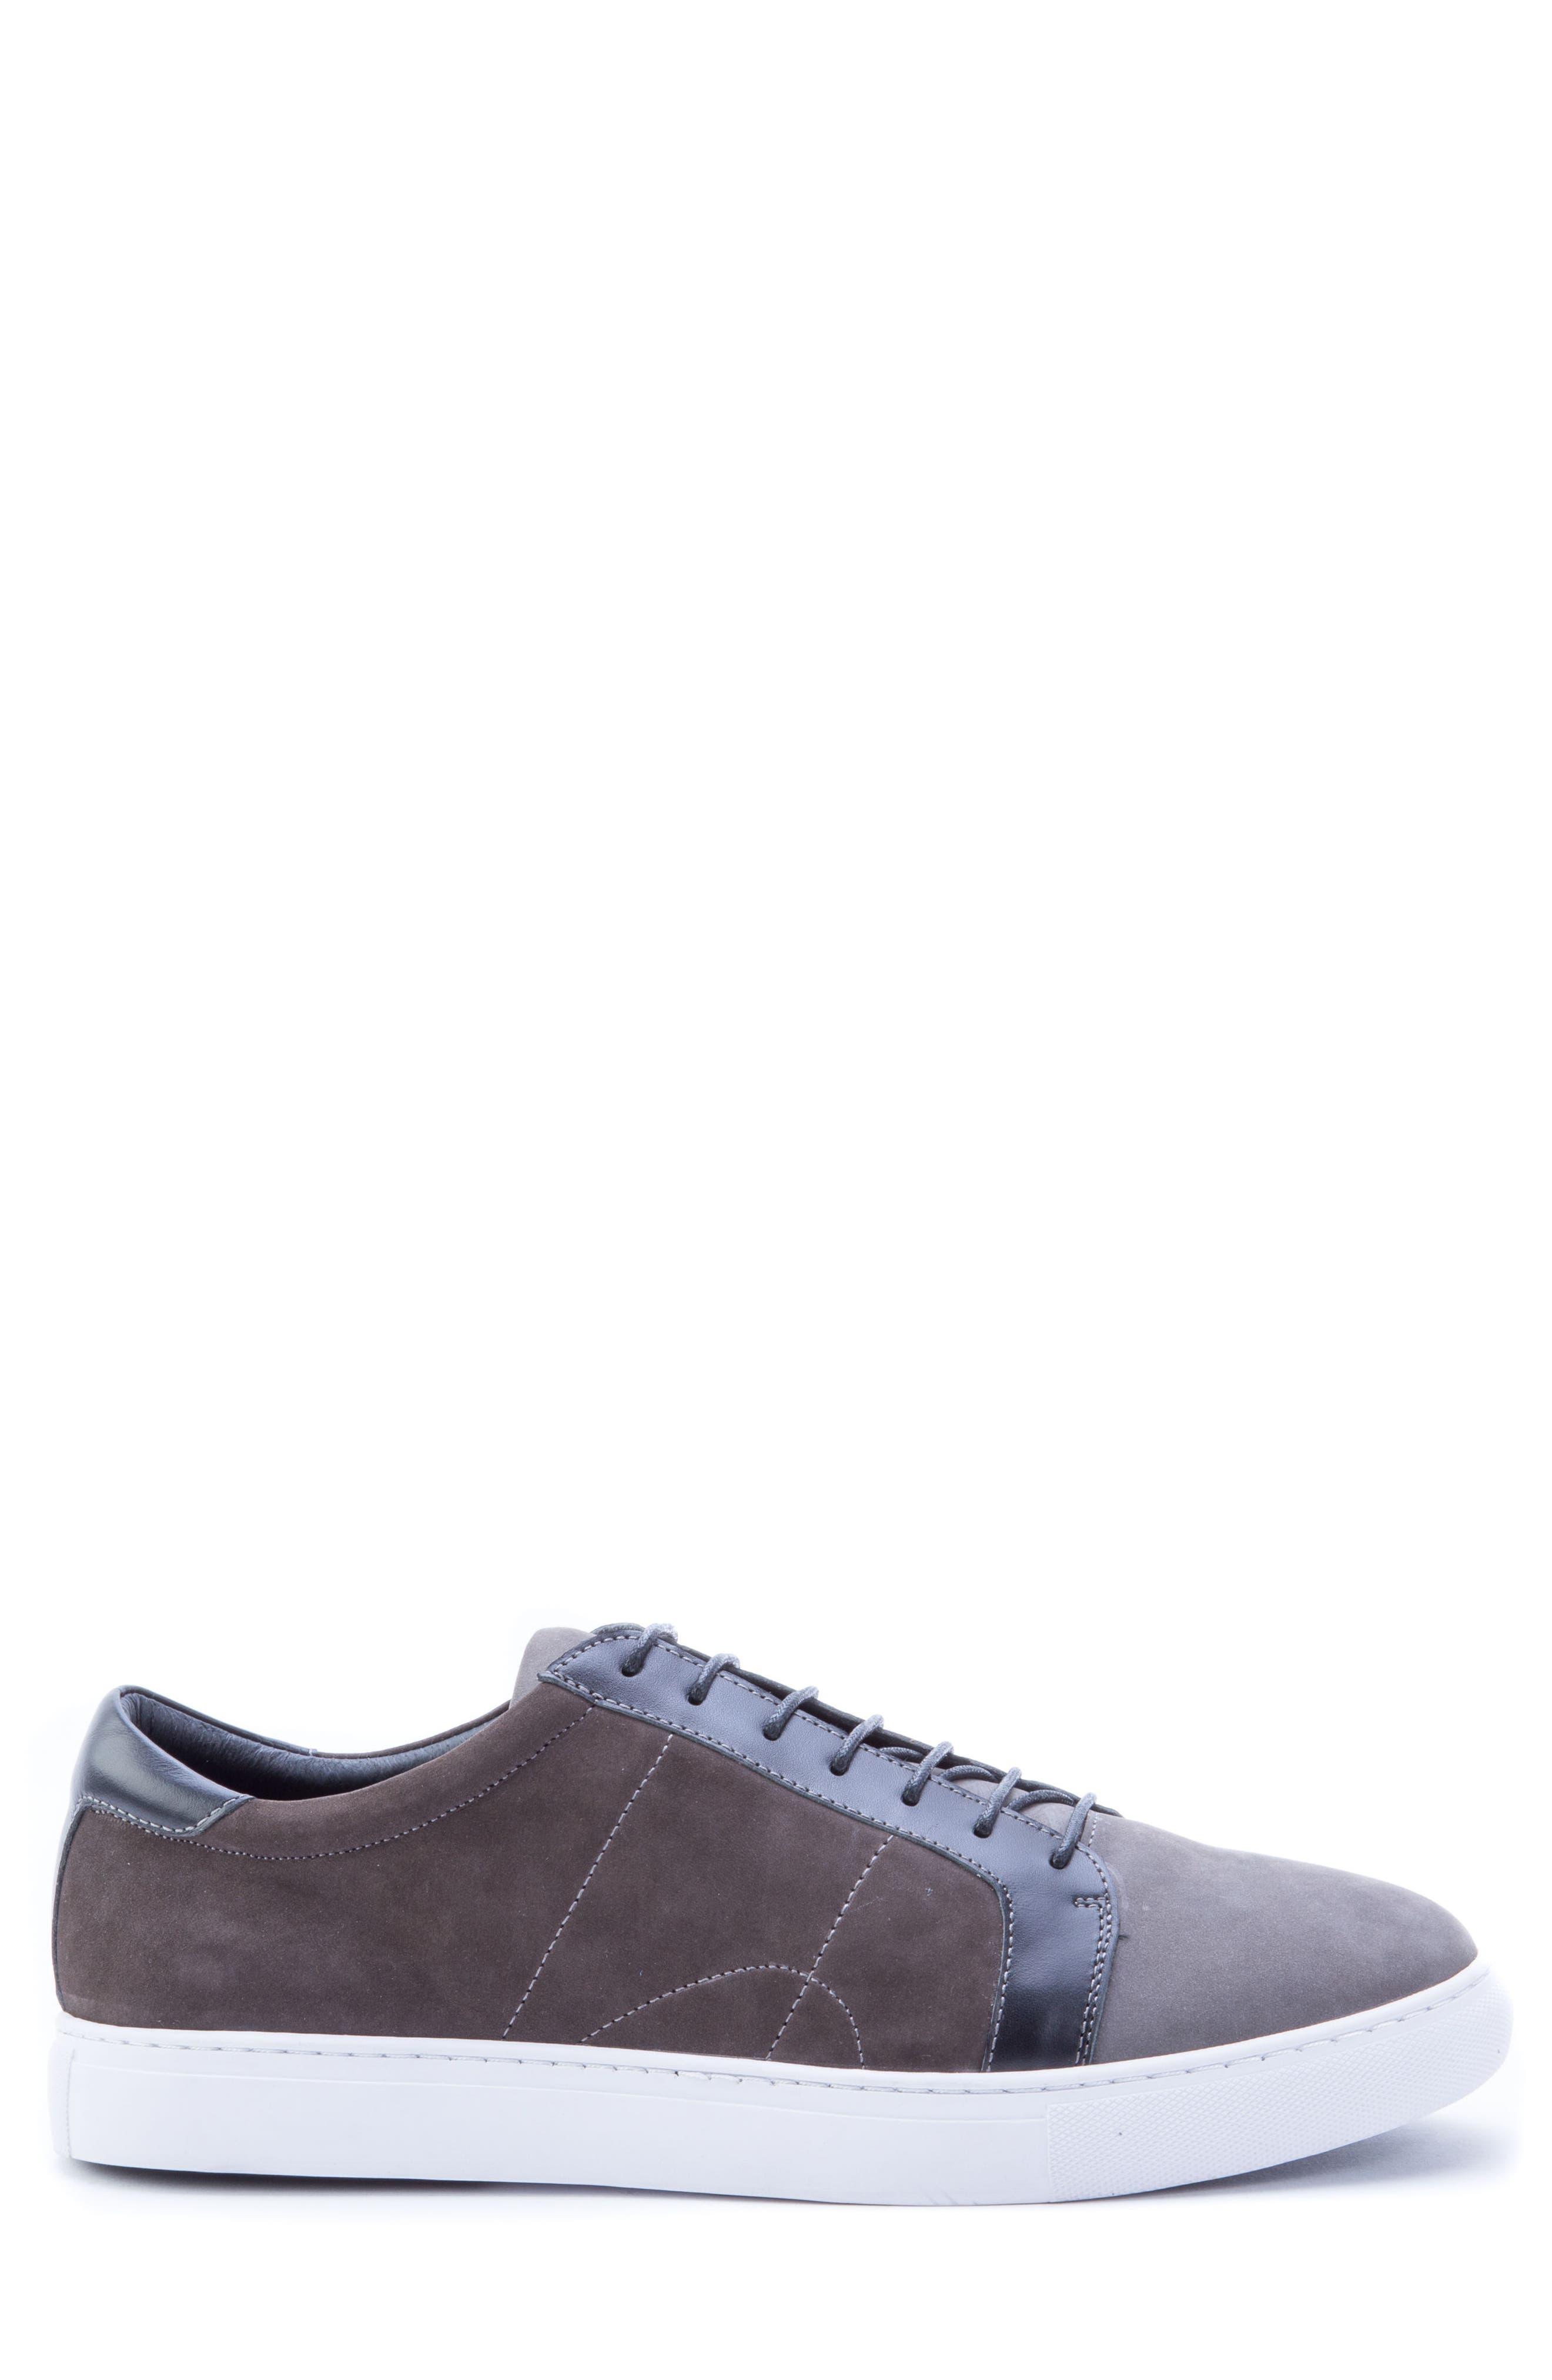 ROBERT GRAHAM, Gonzalo Low Top Sneaker, Alternate thumbnail 3, color, GREY SUEDE